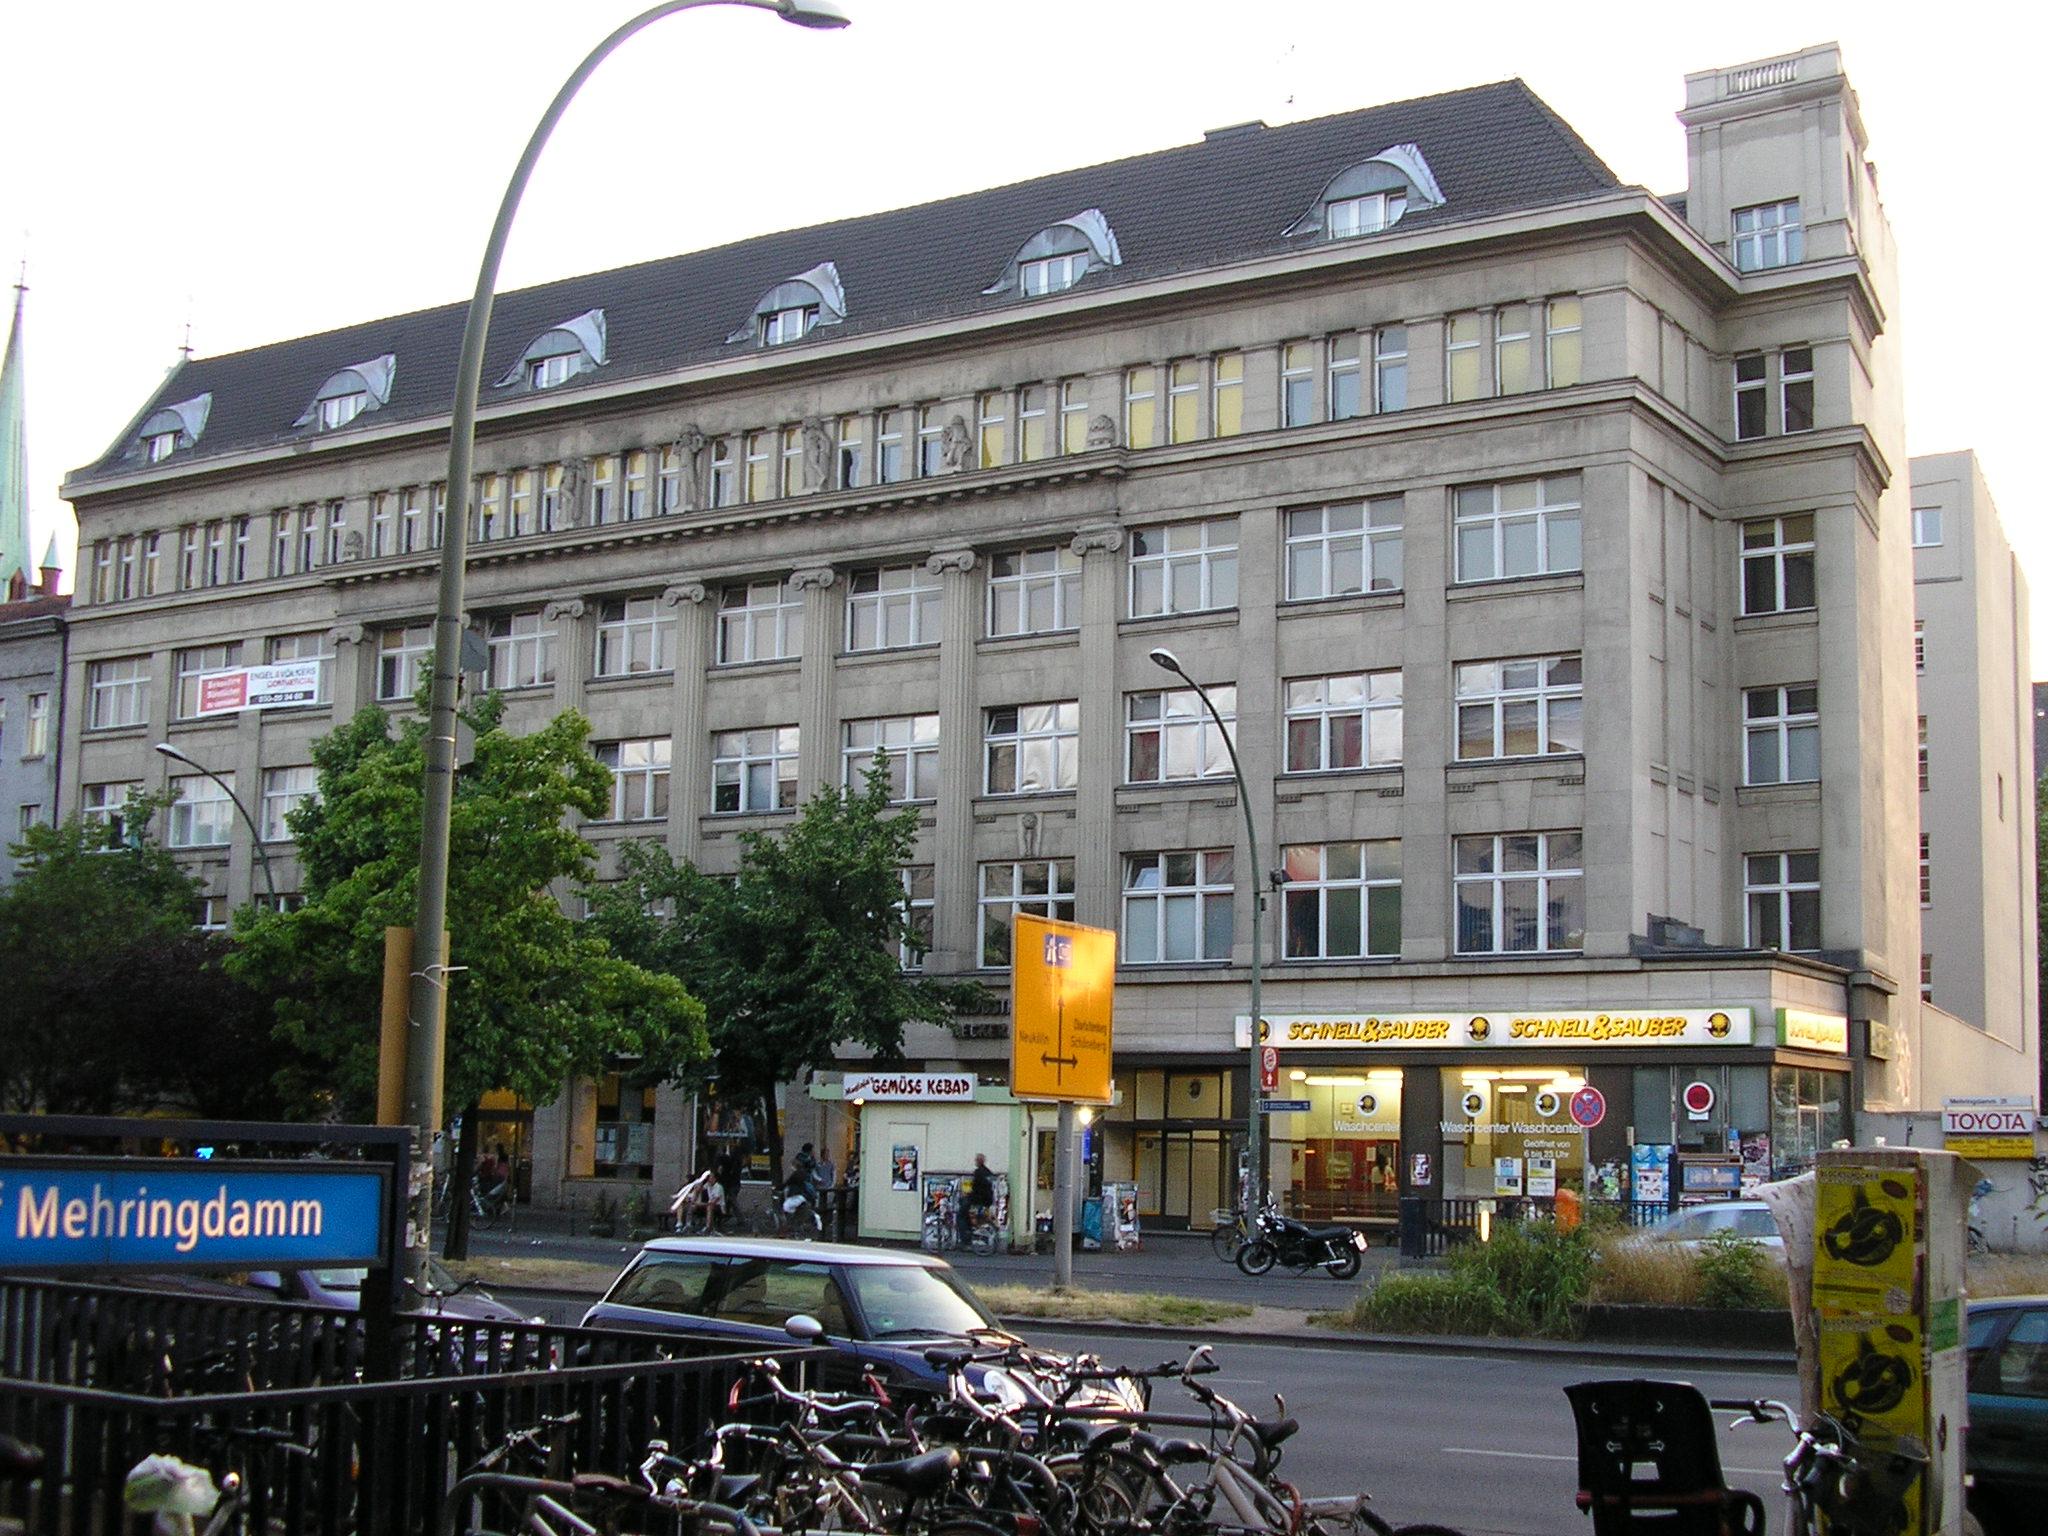 File Berlin Kreuzberg Mehringdamm 32 34 Jpg Wikimedia